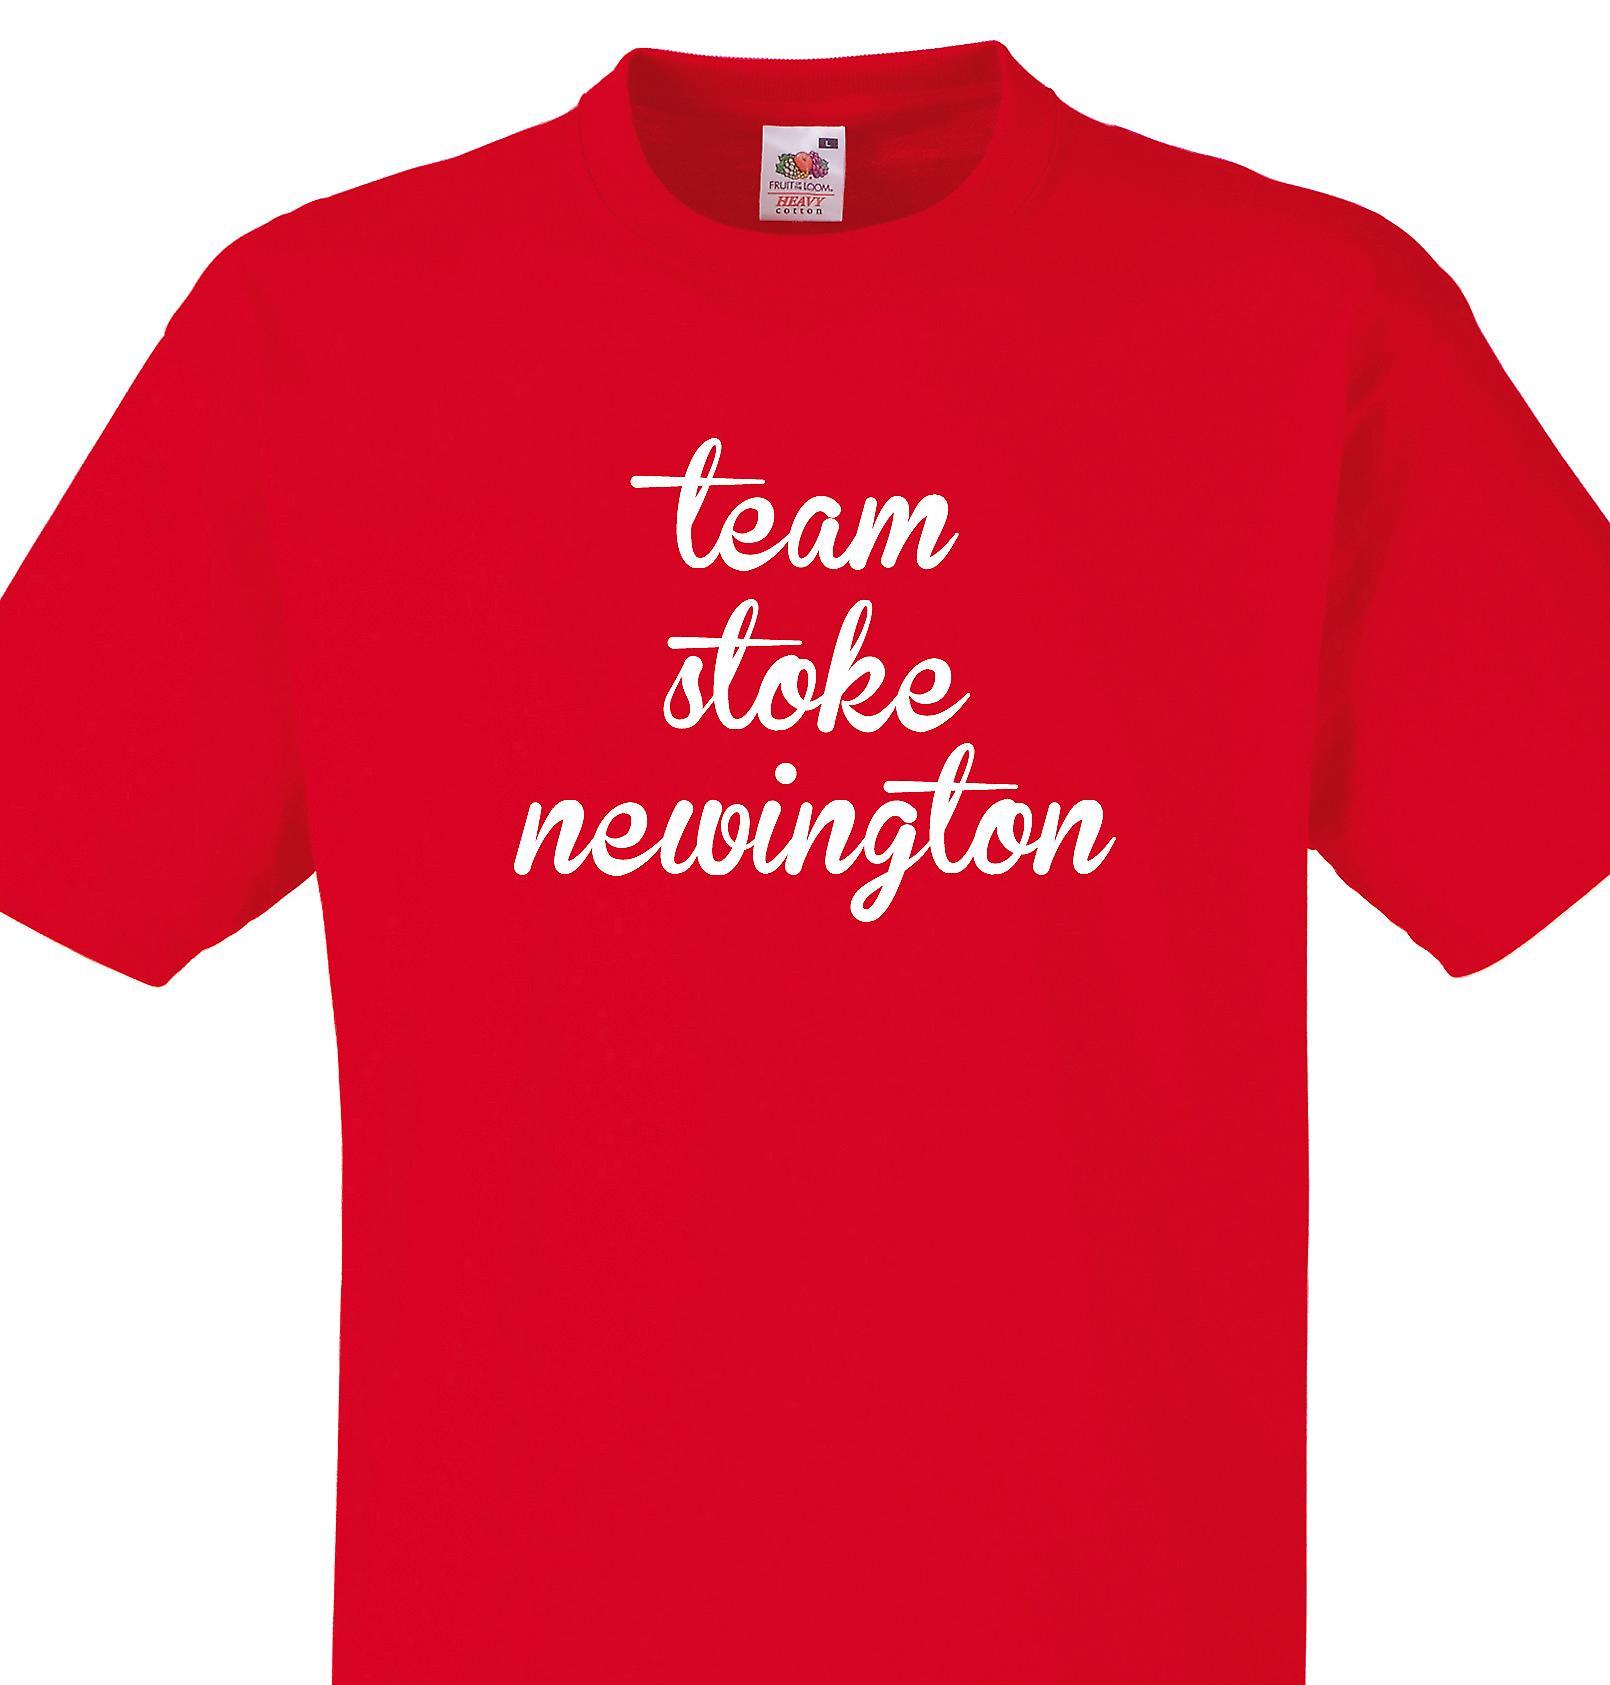 Team Stoke newington Red T shirt